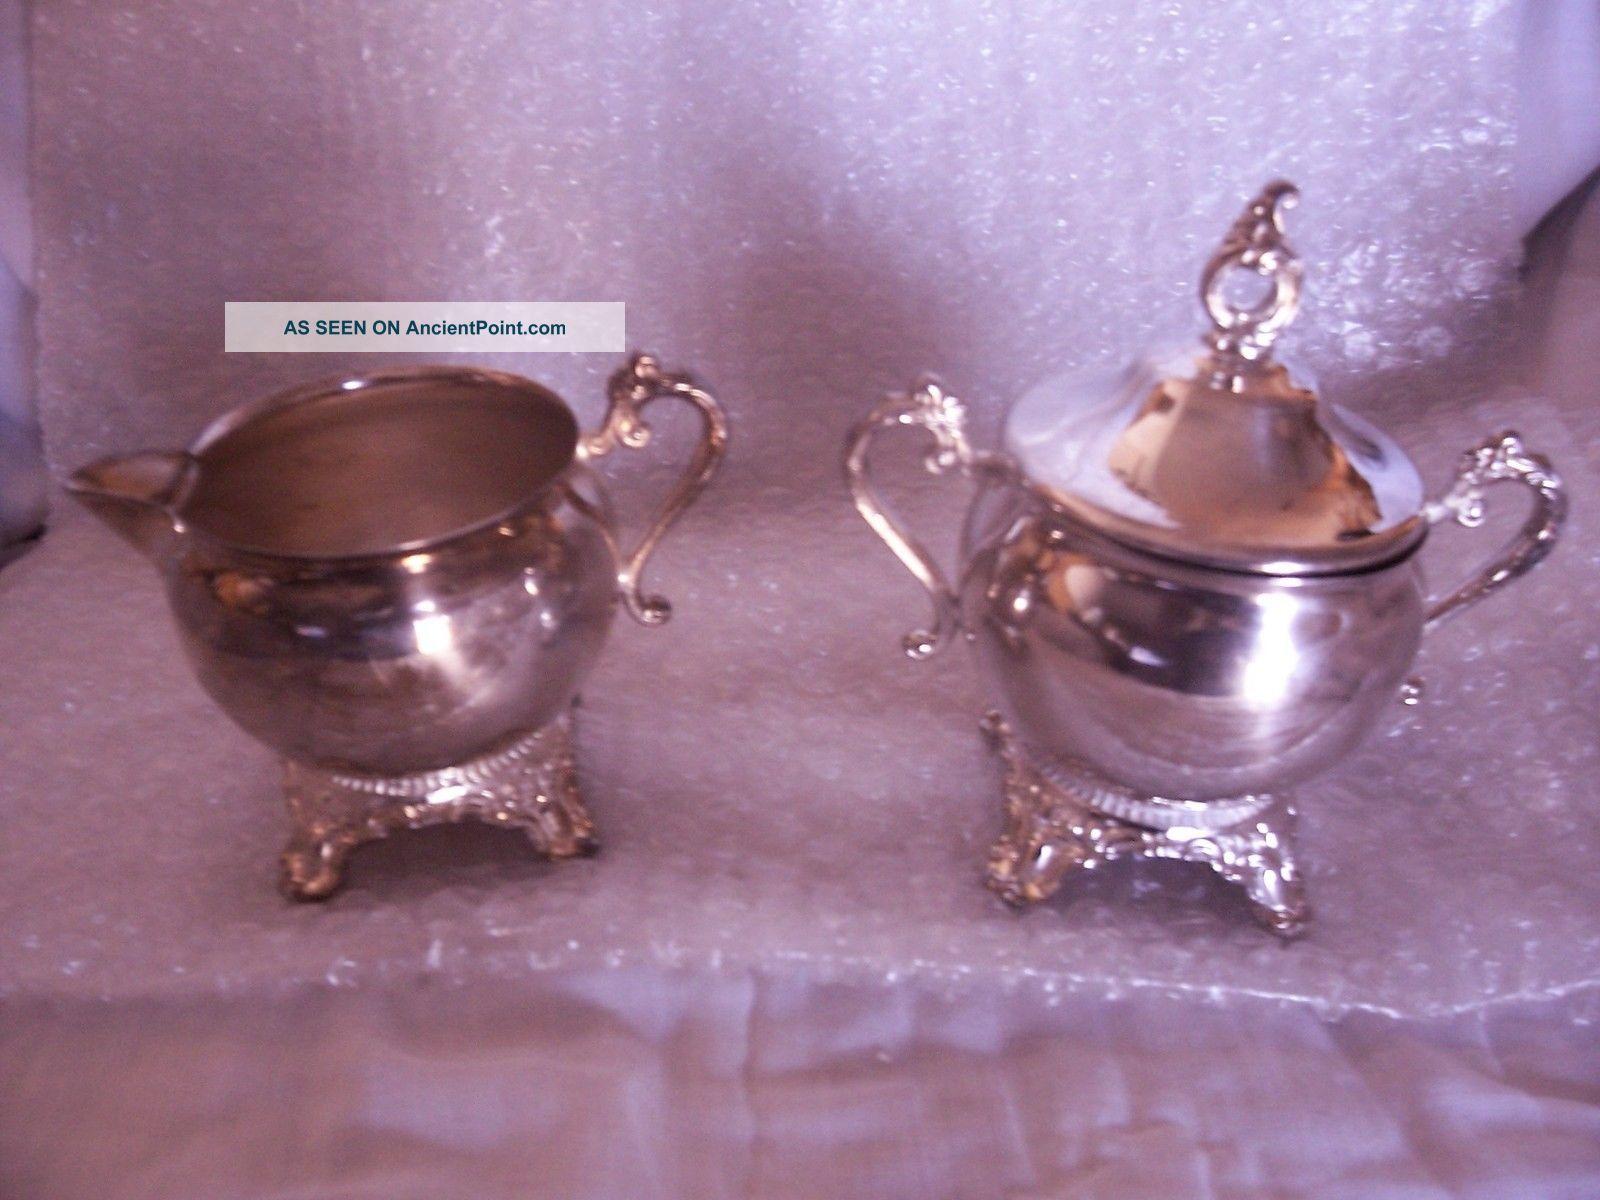 Gorham Newport Silver Plate Sugar Bowl & Creamer Antique Ex++ Condition Look - C Creamers & Sugar Bowls photo